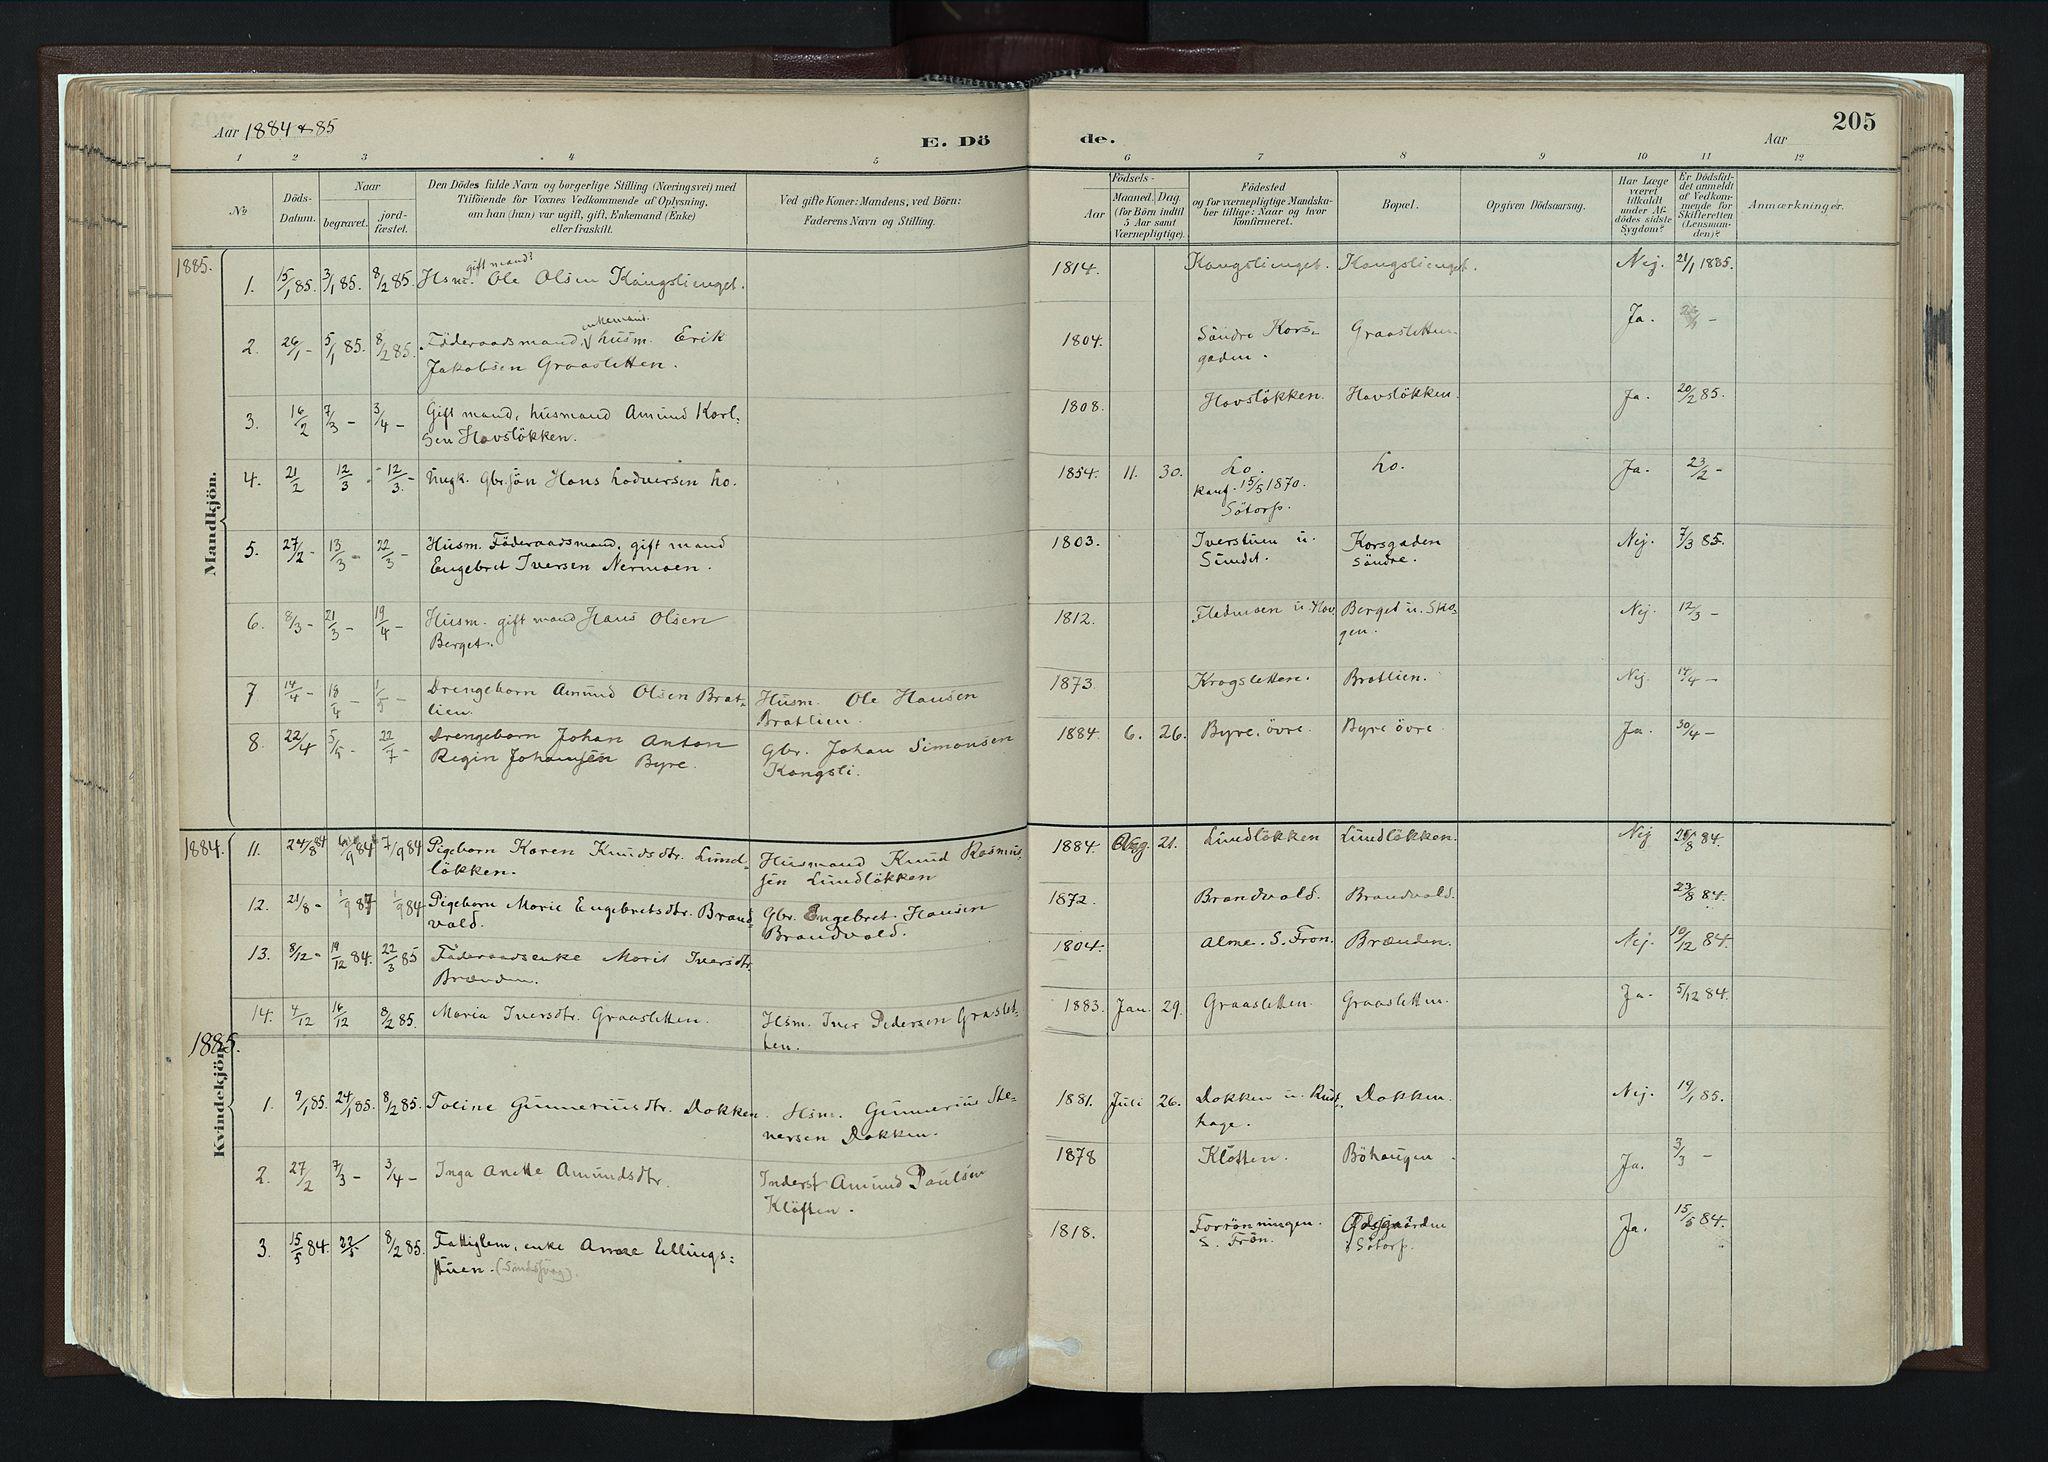 SAH, Nord-Fron prestekontor, Ministerialbok nr. 4, 1884-1914, s. 205